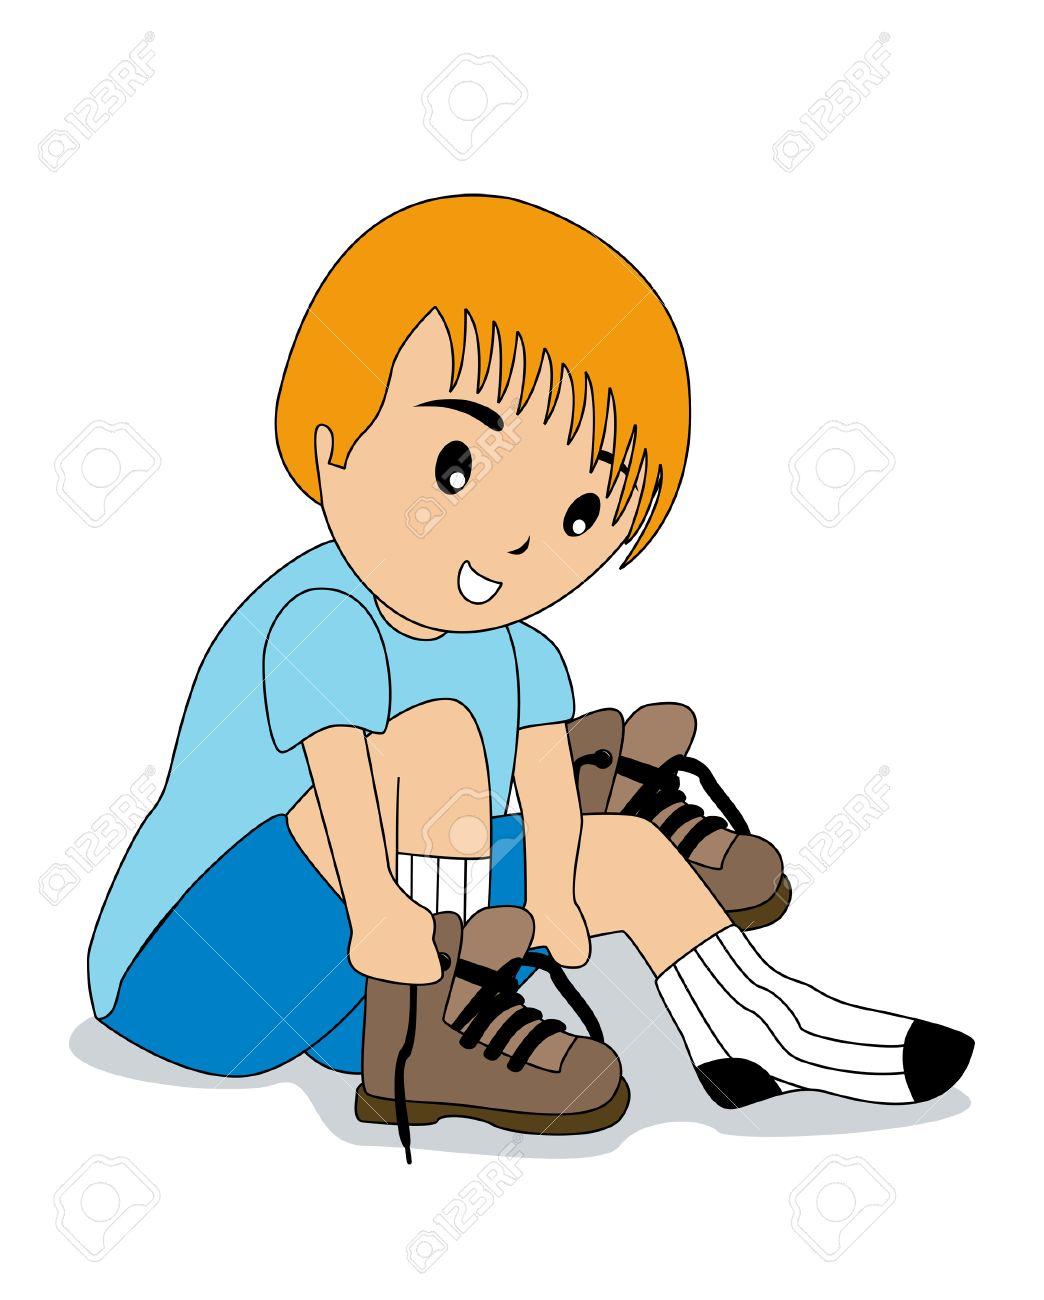 Boy Tying Shoelaces Royalty Free